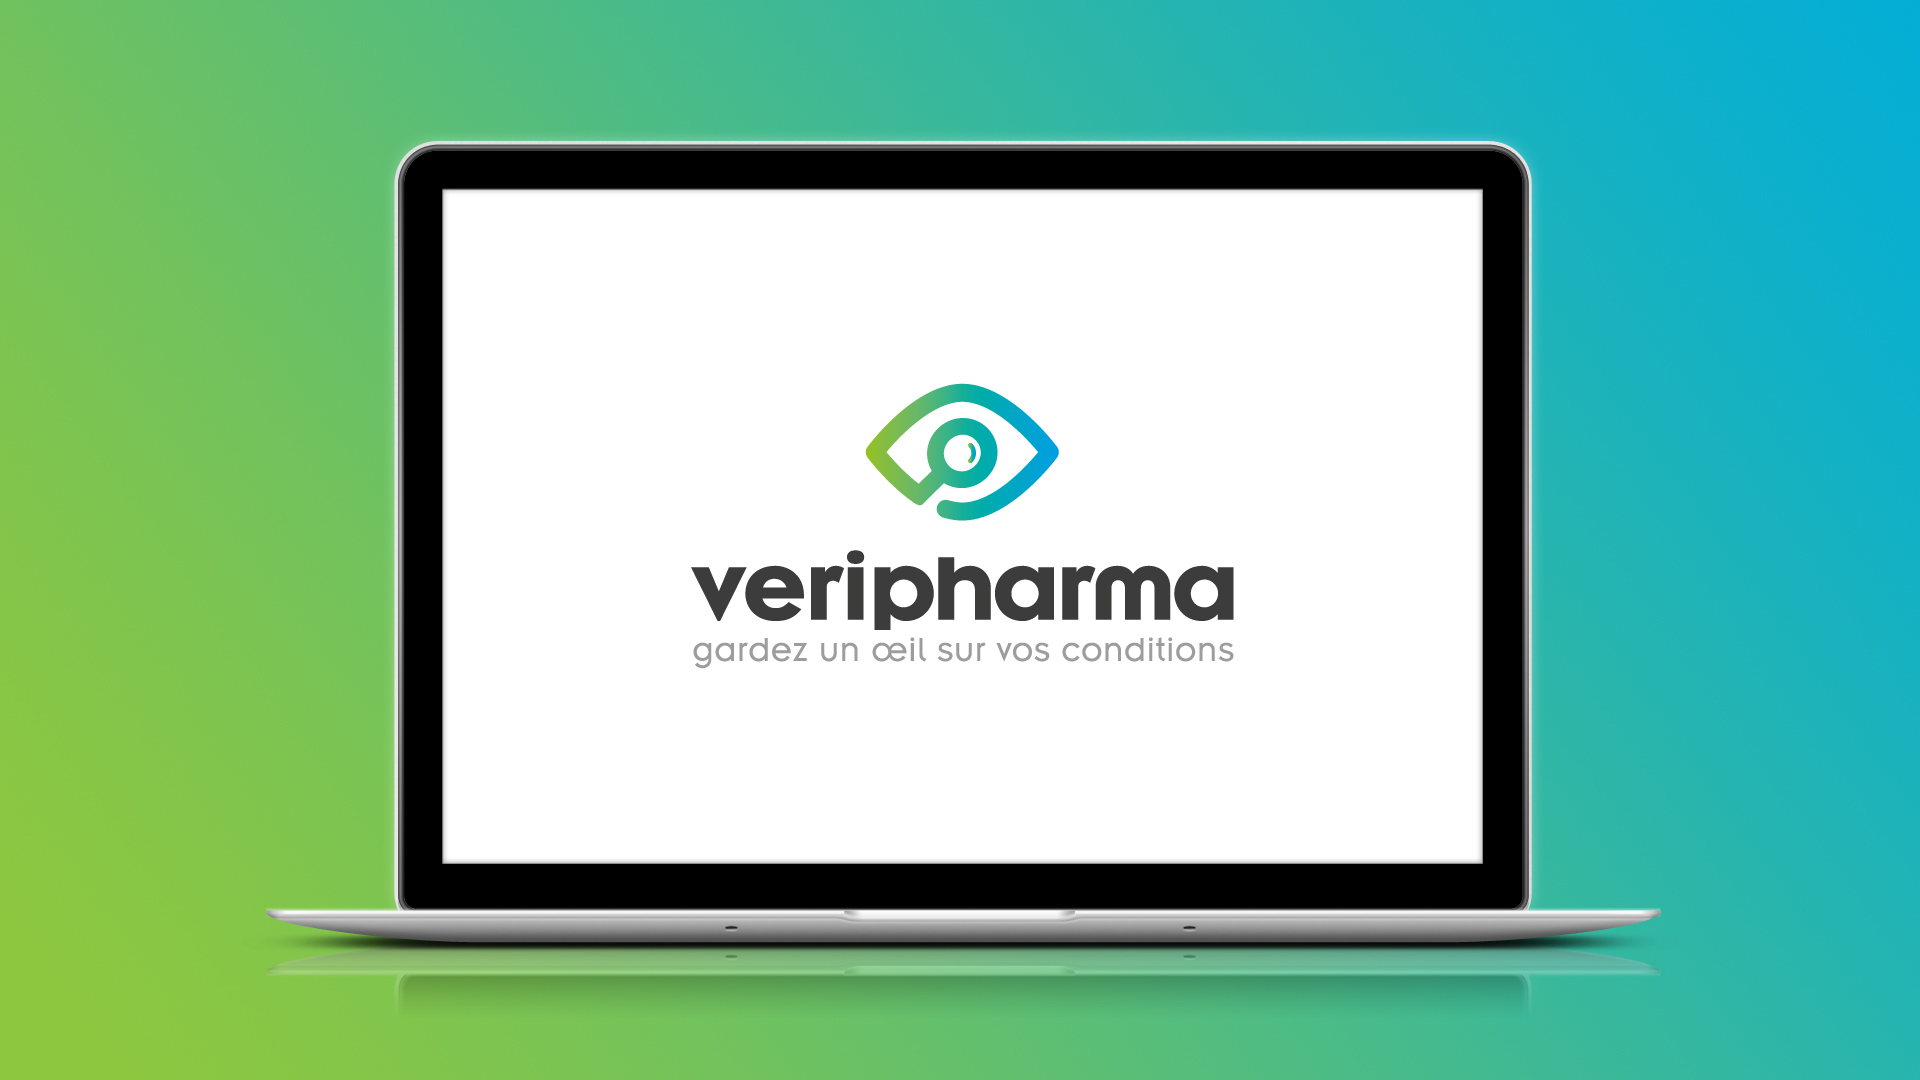 veripharma-creation-logo-site-internet-caconcept-alexis-cretin-graphiste-montpellier